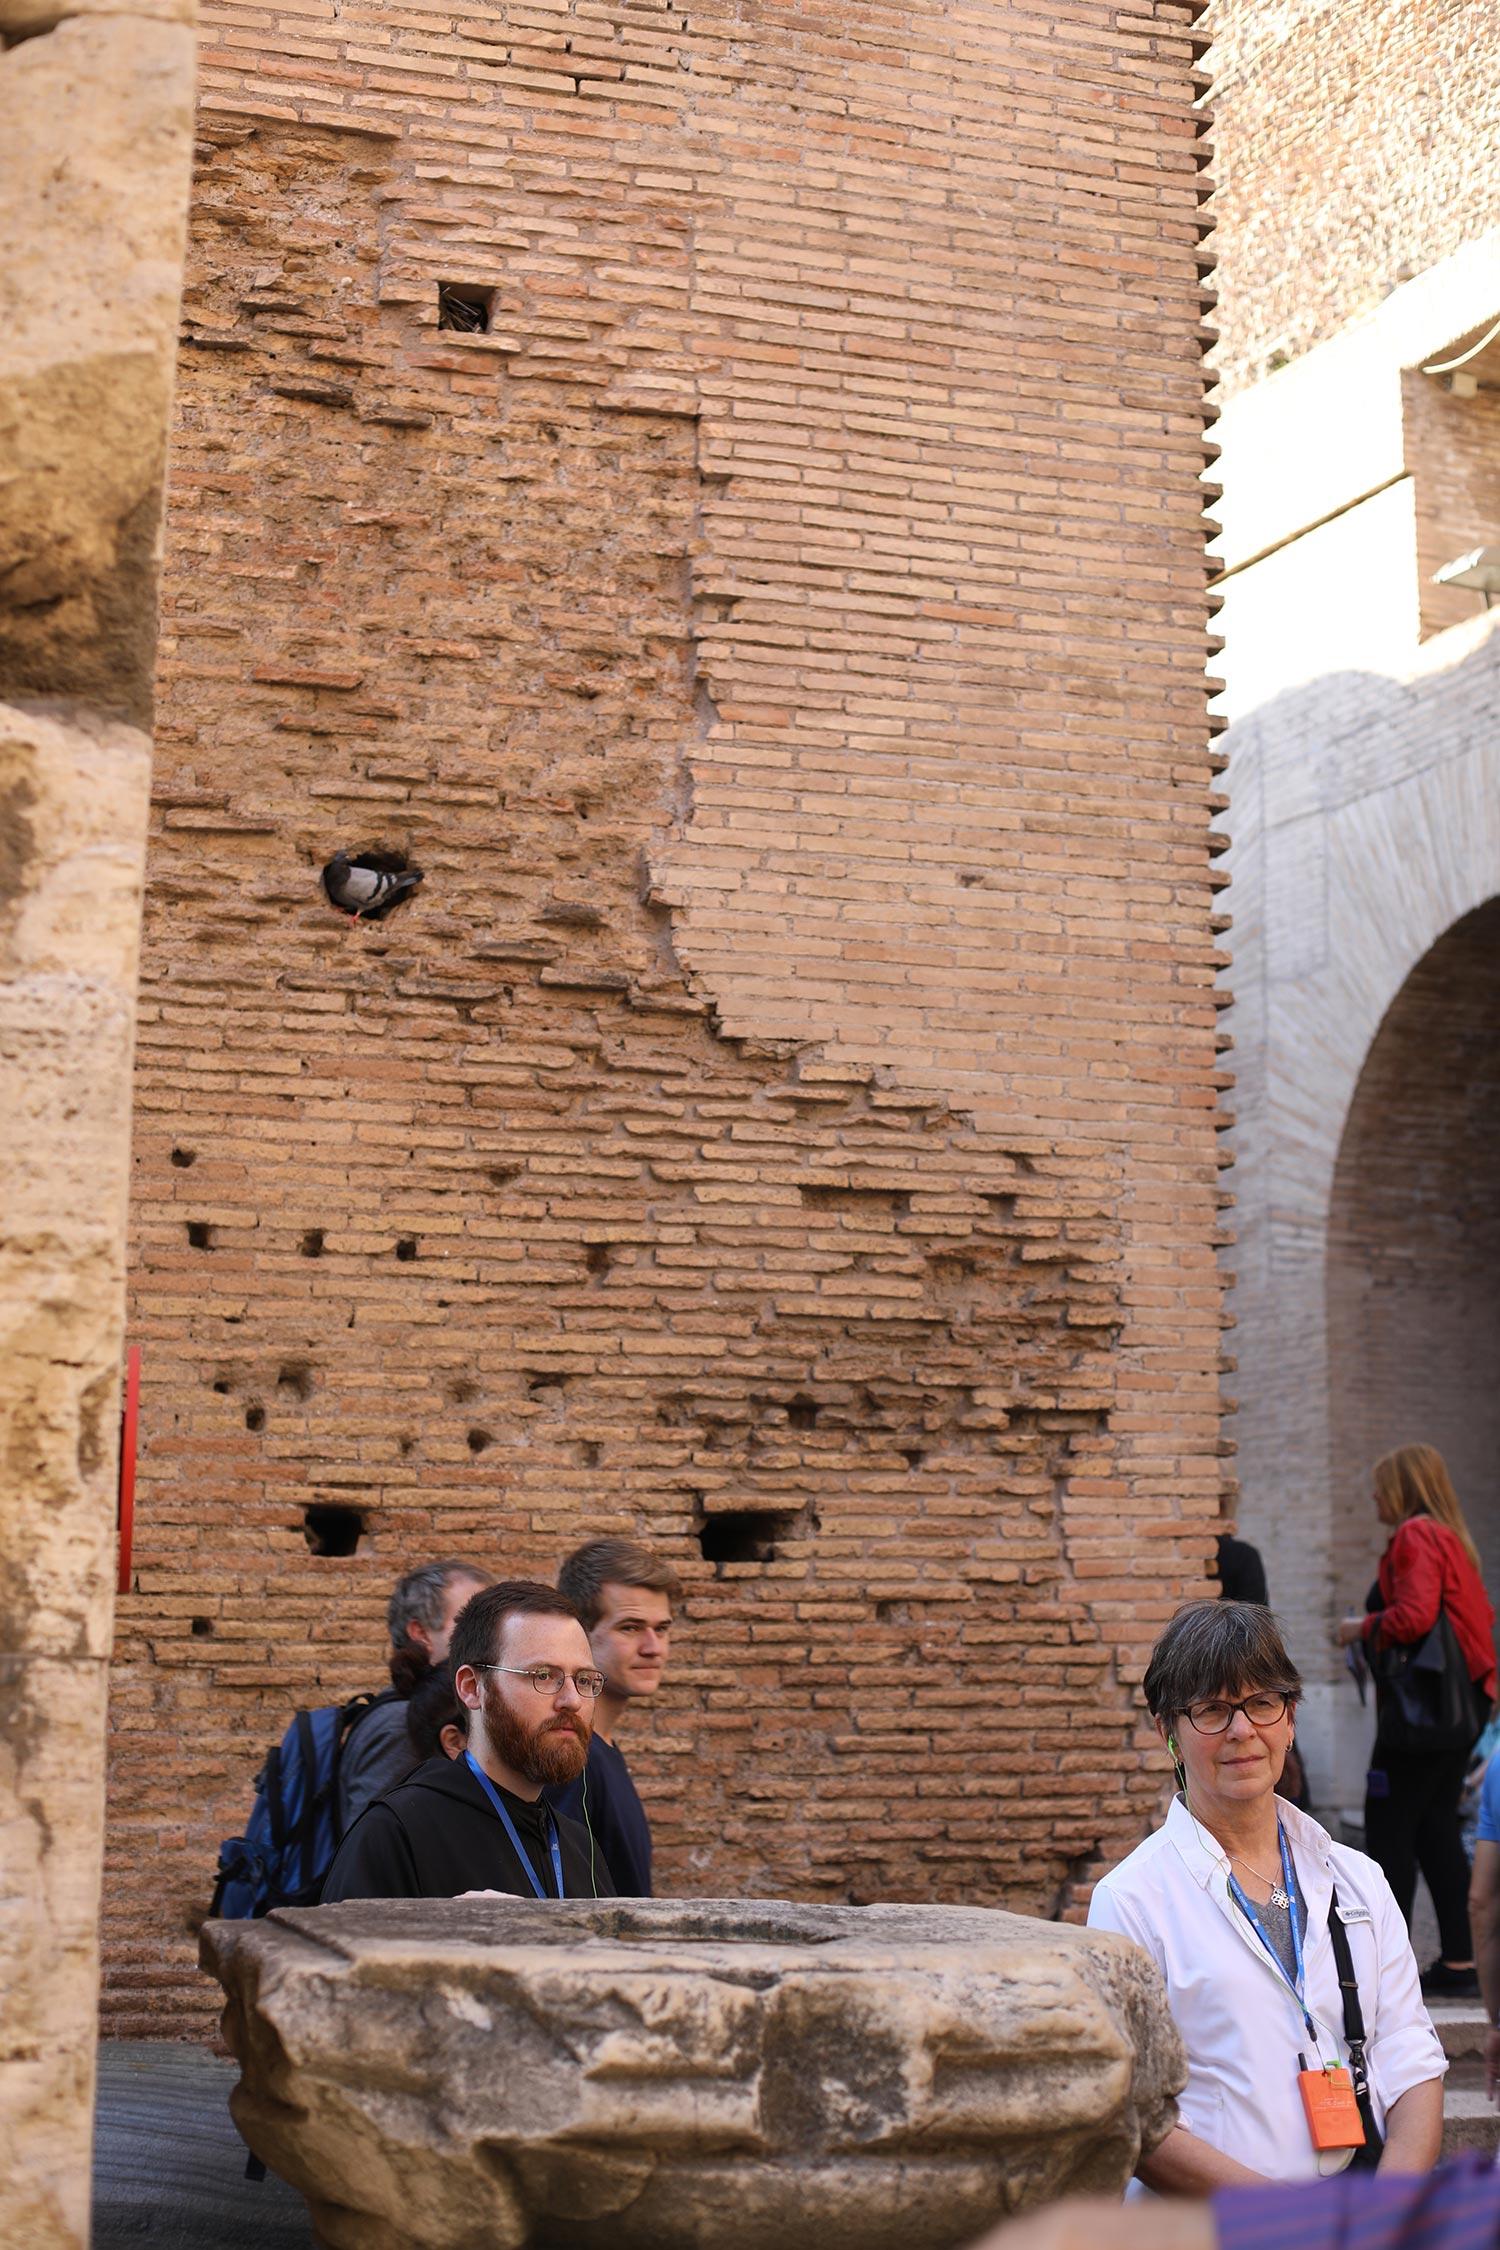 Pilgrimage_Rome_3455_Colo.jpg